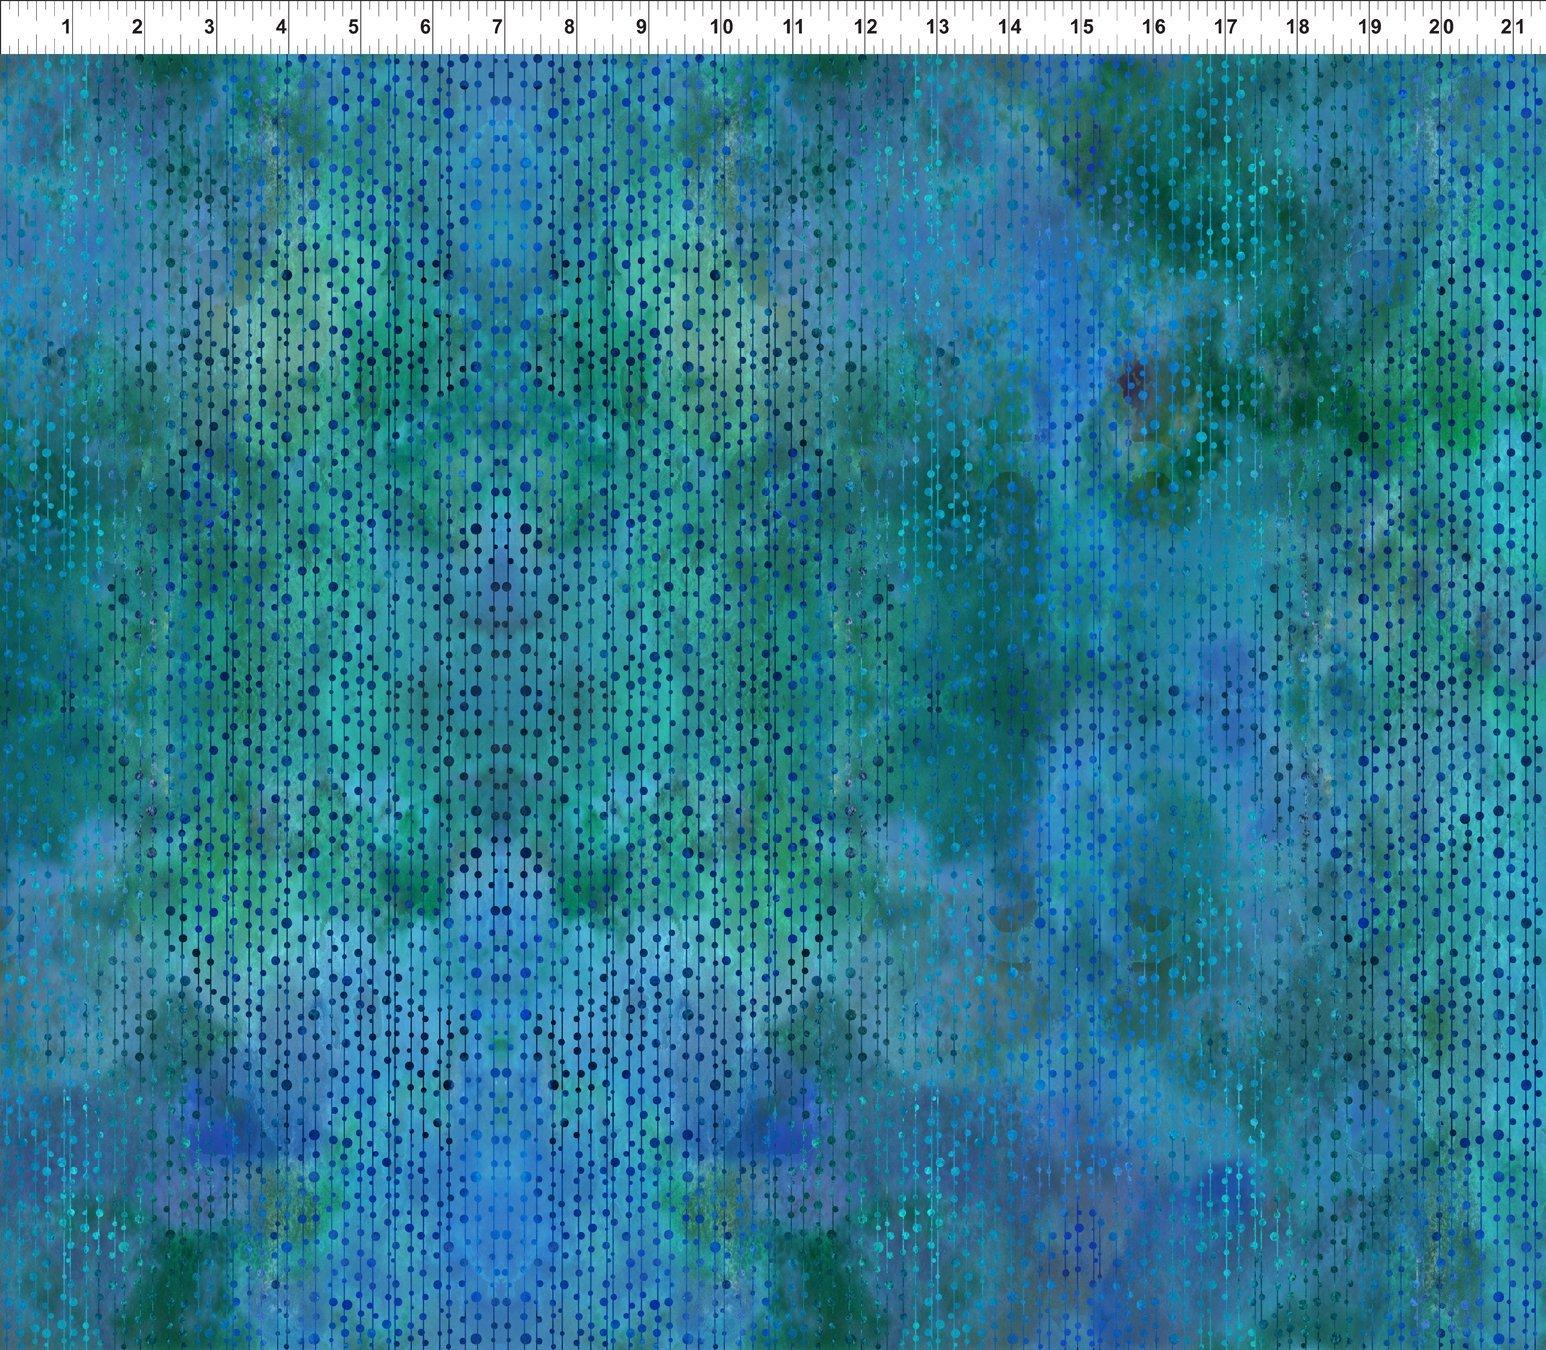 Garden of Dreams Beads Bluegreen